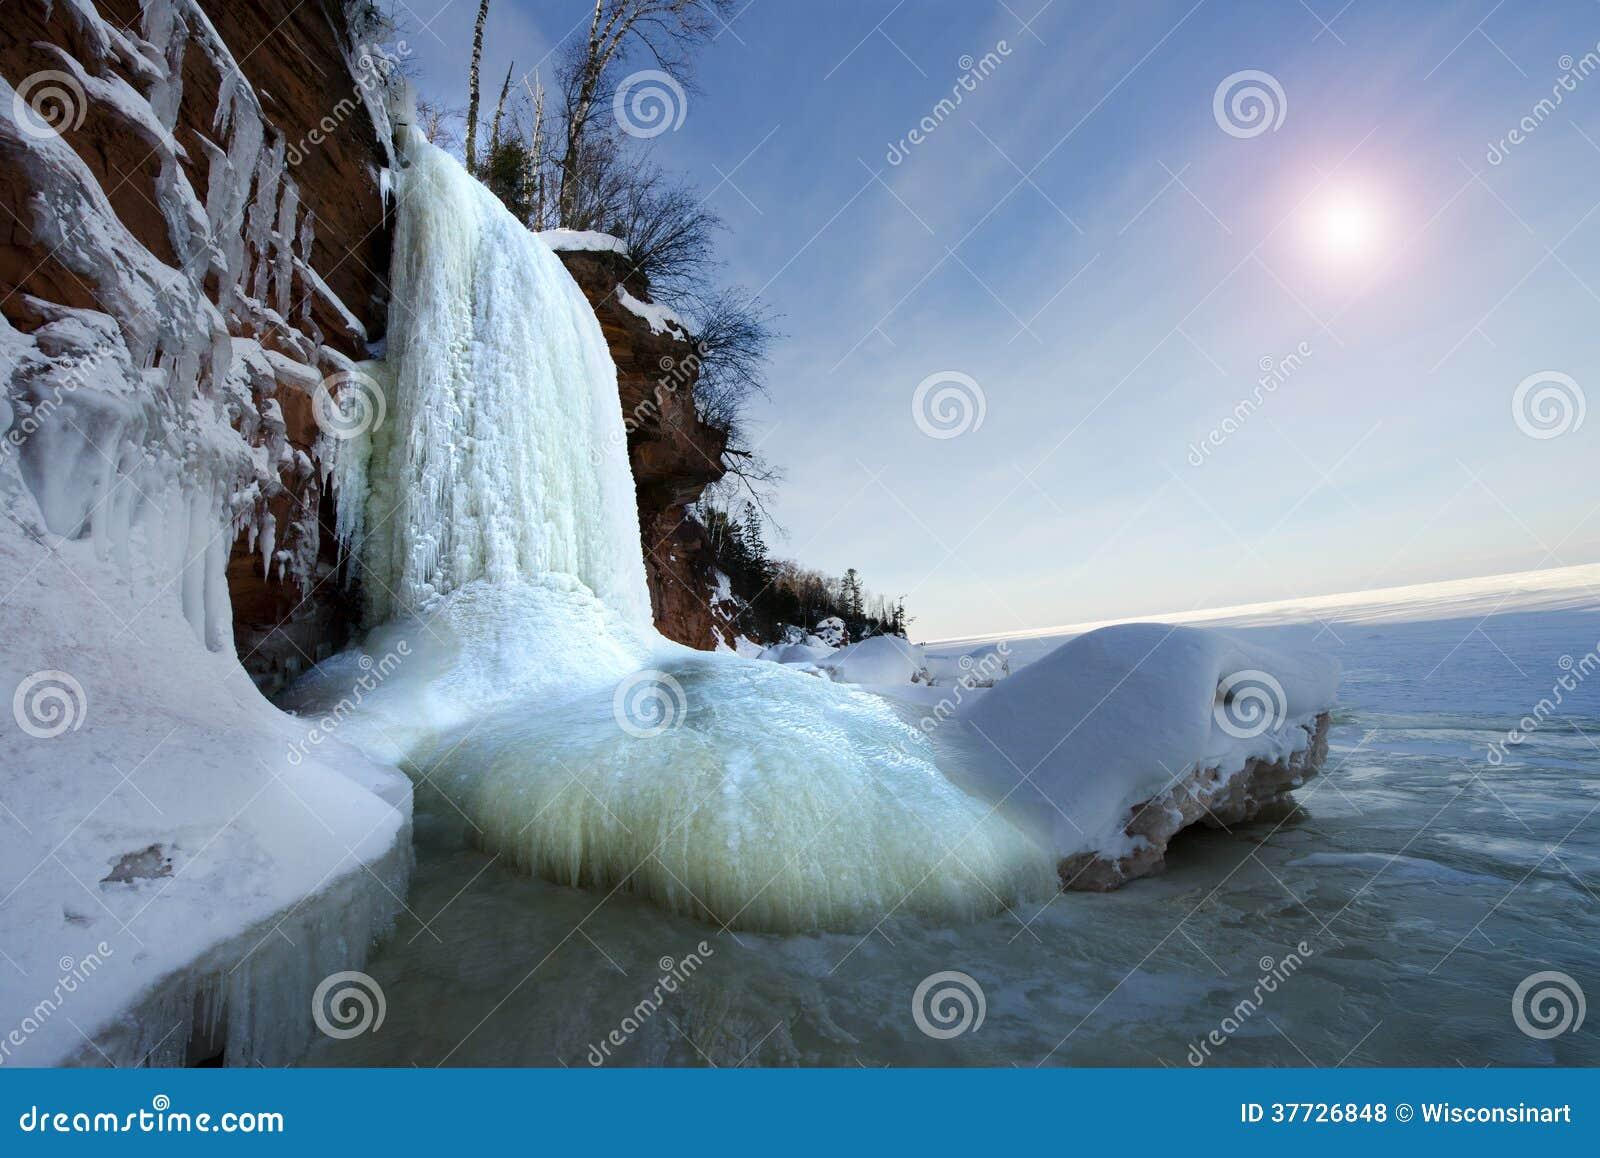 Apostle Islands Ice Caves Frozen Waterfall, Winter